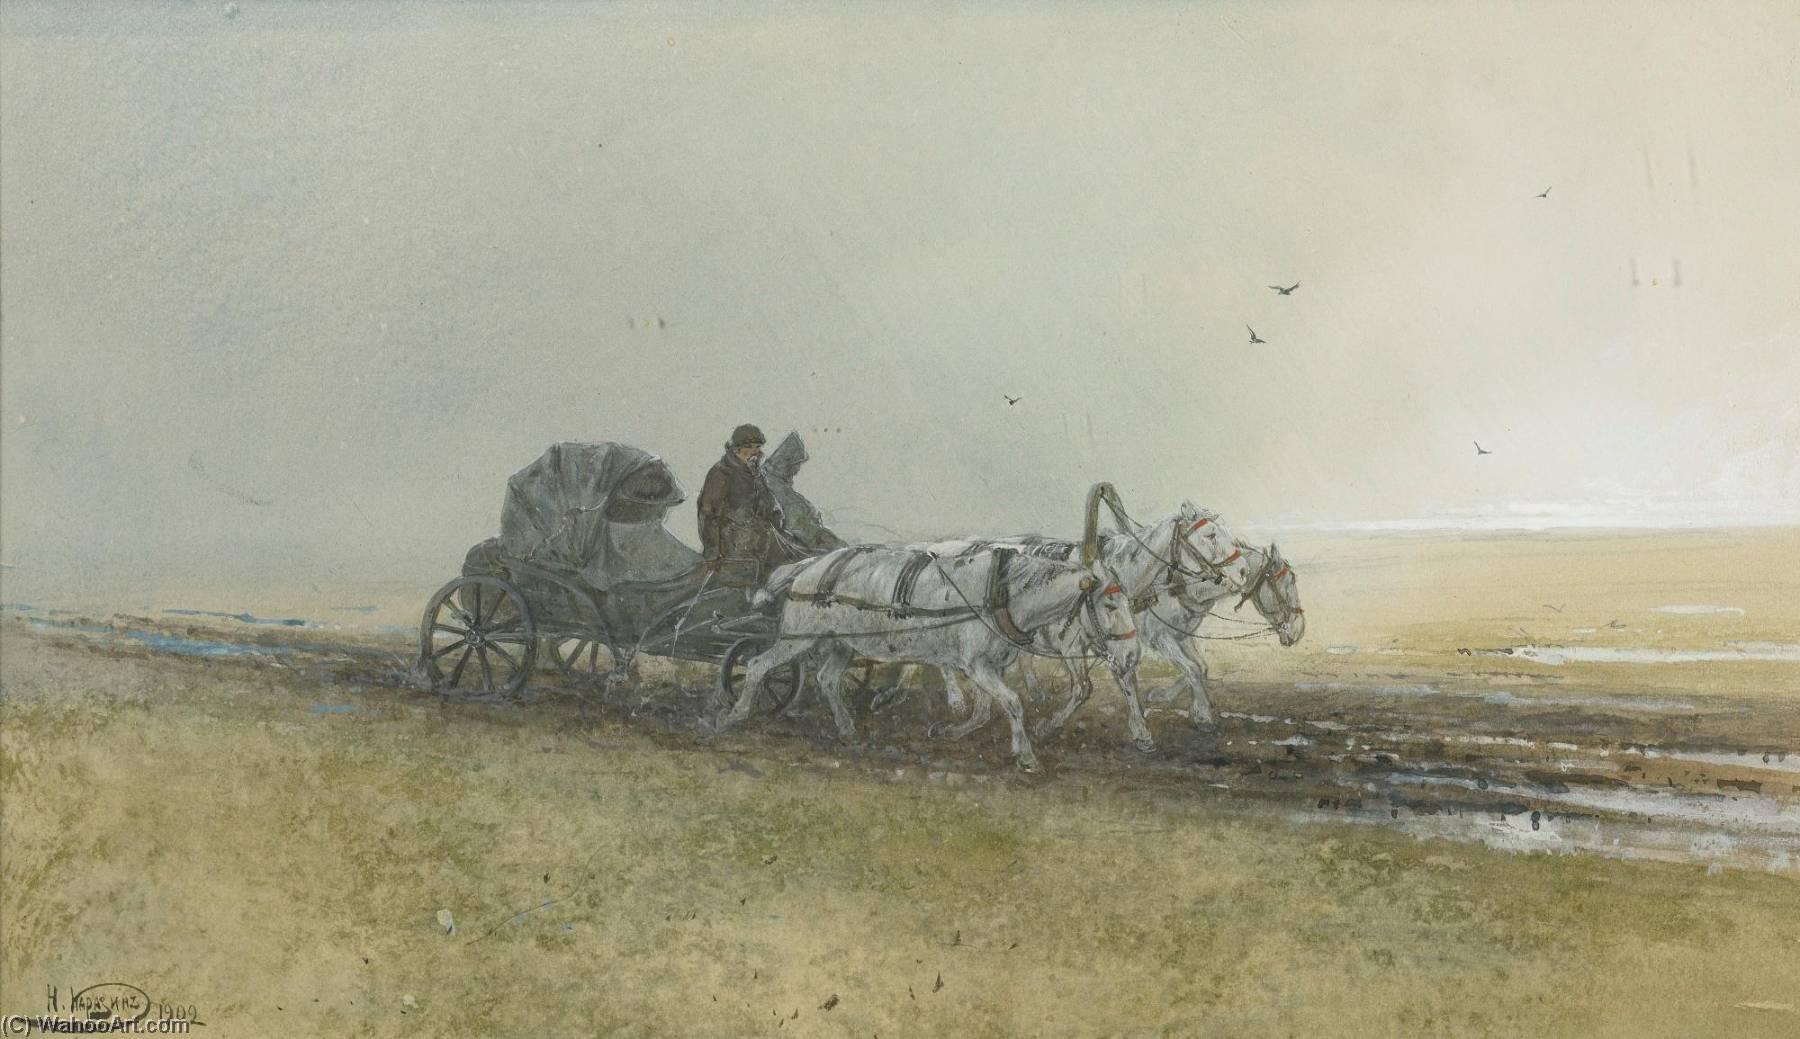 Wikioo.org - The Encyclopedia of Fine Arts - Painting, Artwork by Nikolai Nikolaevich Karazin - Travelers Driving a Troika After the Rain